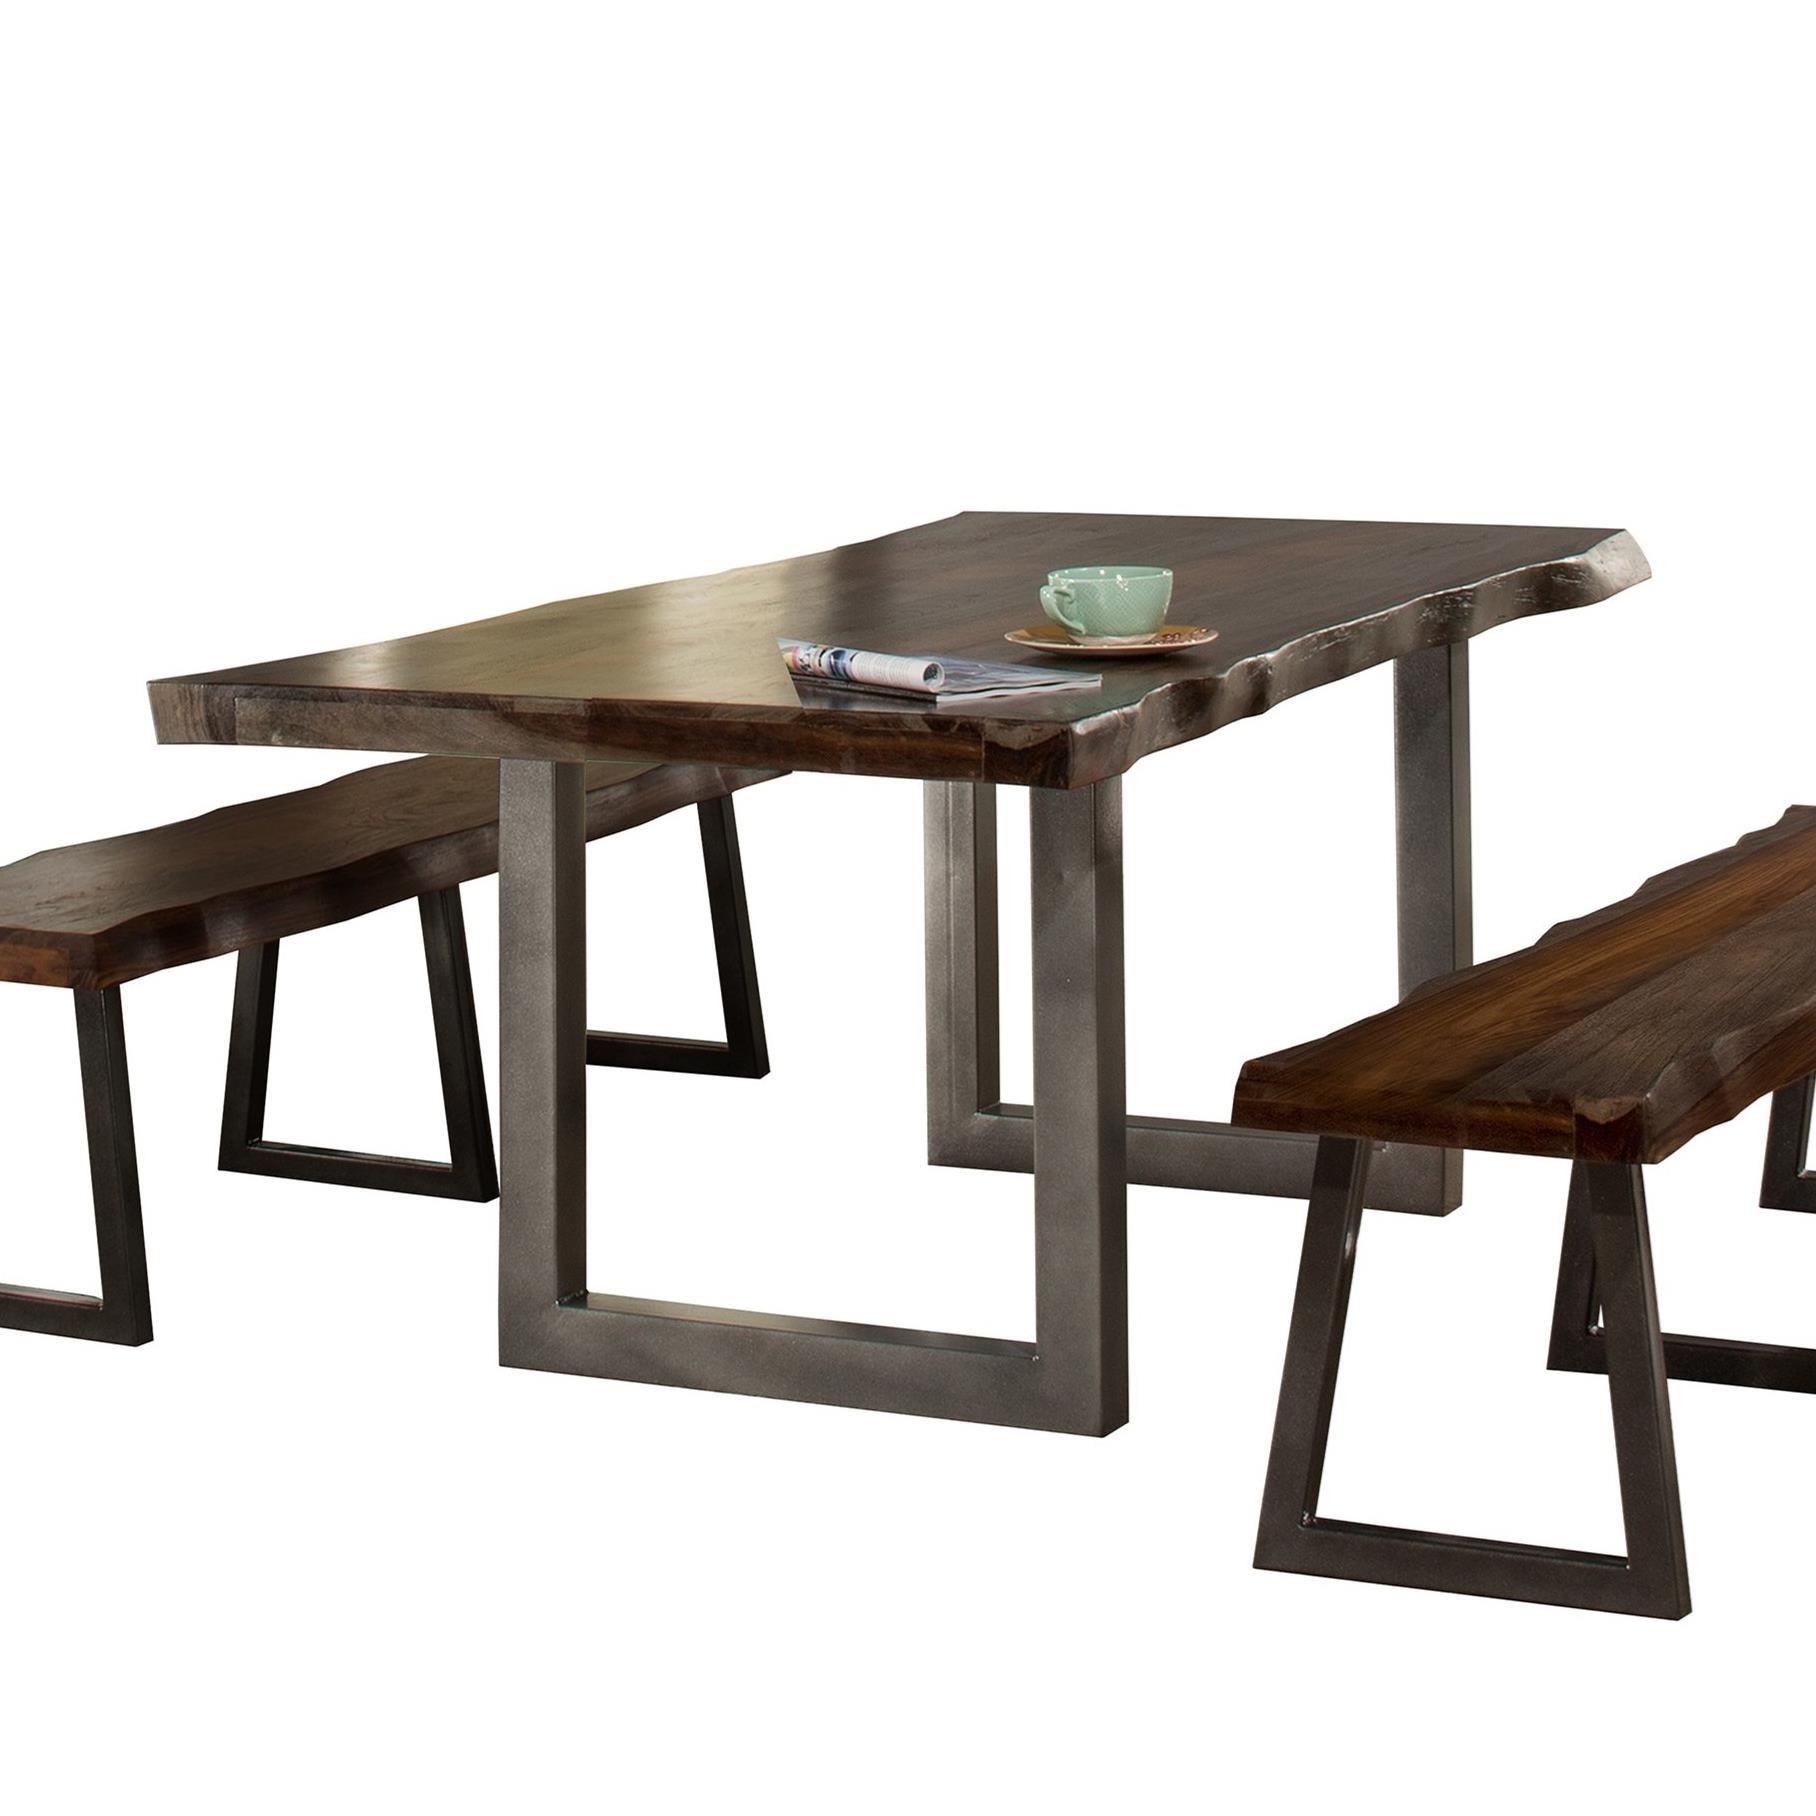 Hillsdale Emerson Natural Sheesham Wood Rectangular Dining Table